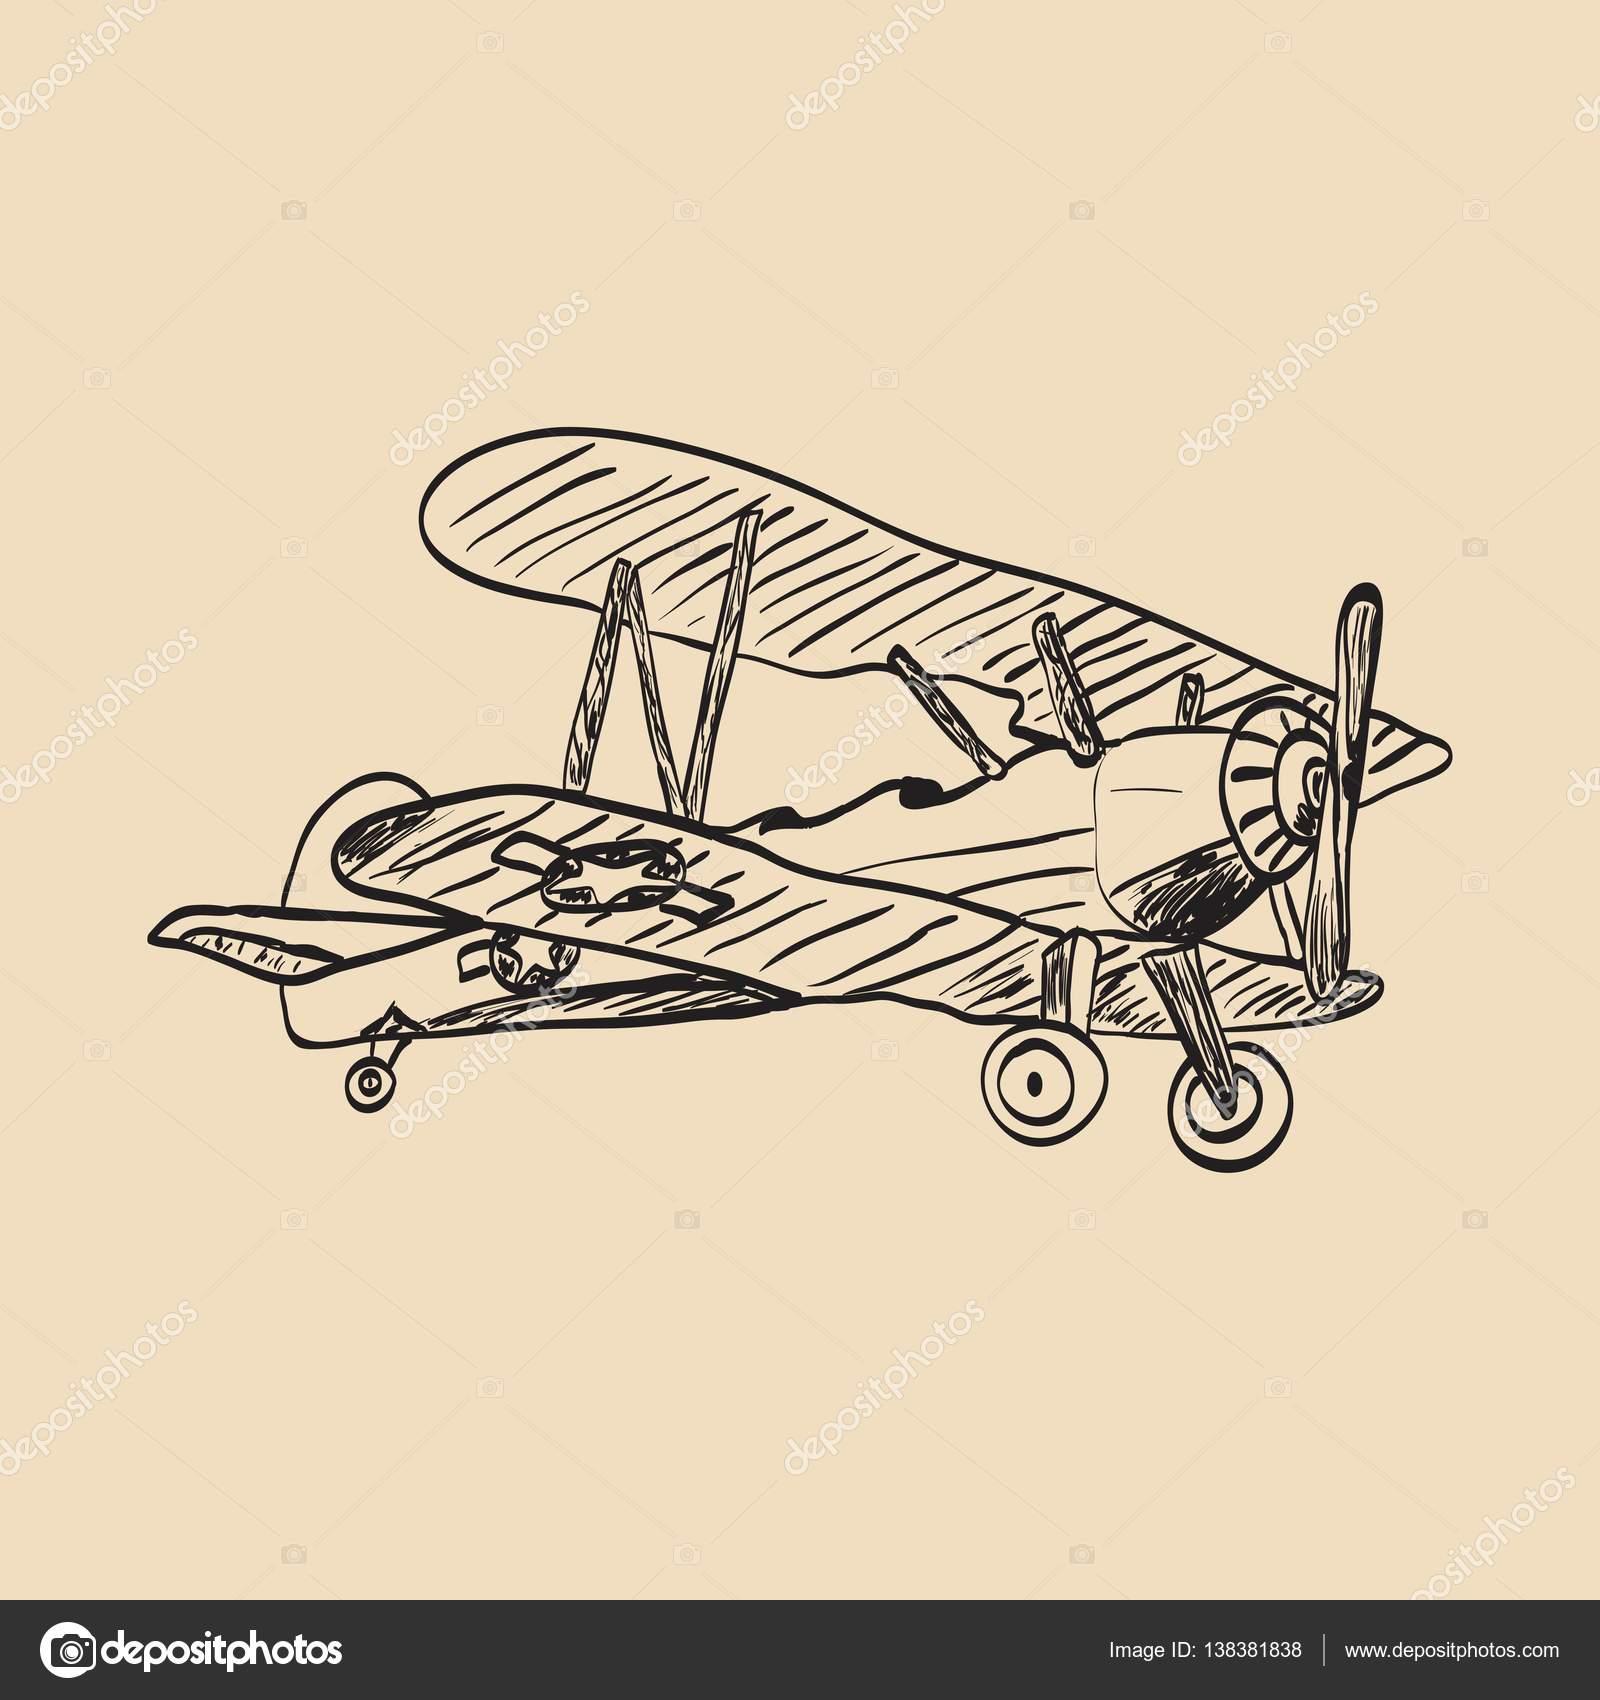 1600x1700 Small Plane Sketch Stock Vector Slasny1988